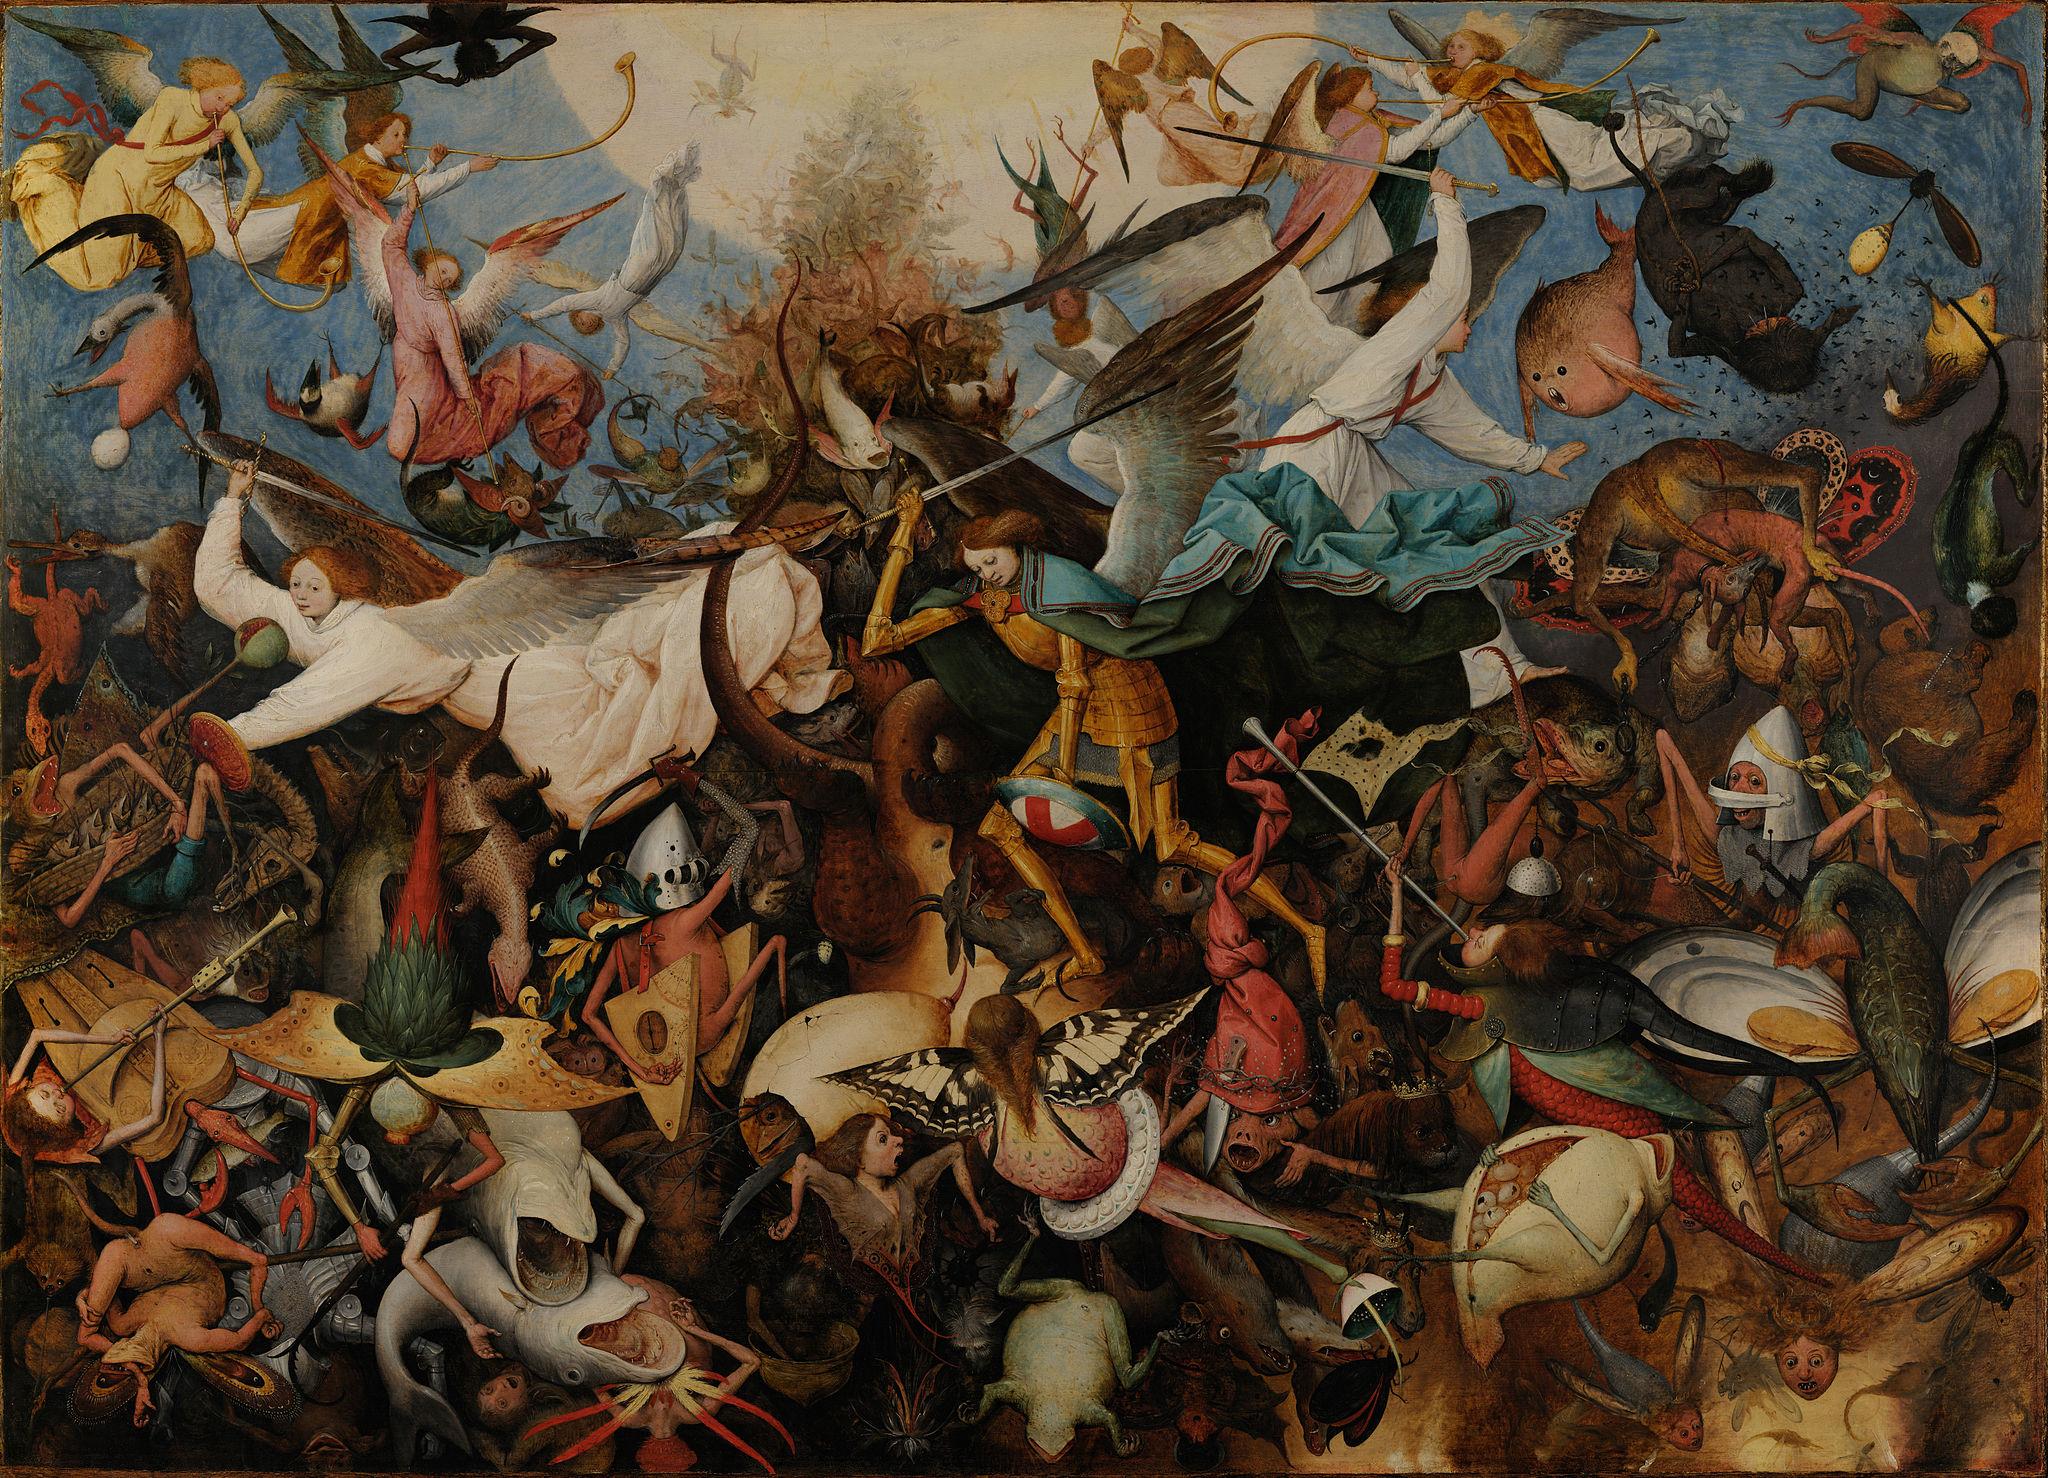 Demonology. The Fall of the Rebel Angels. 1562. Pieter Brueghel the Elder  (1526/